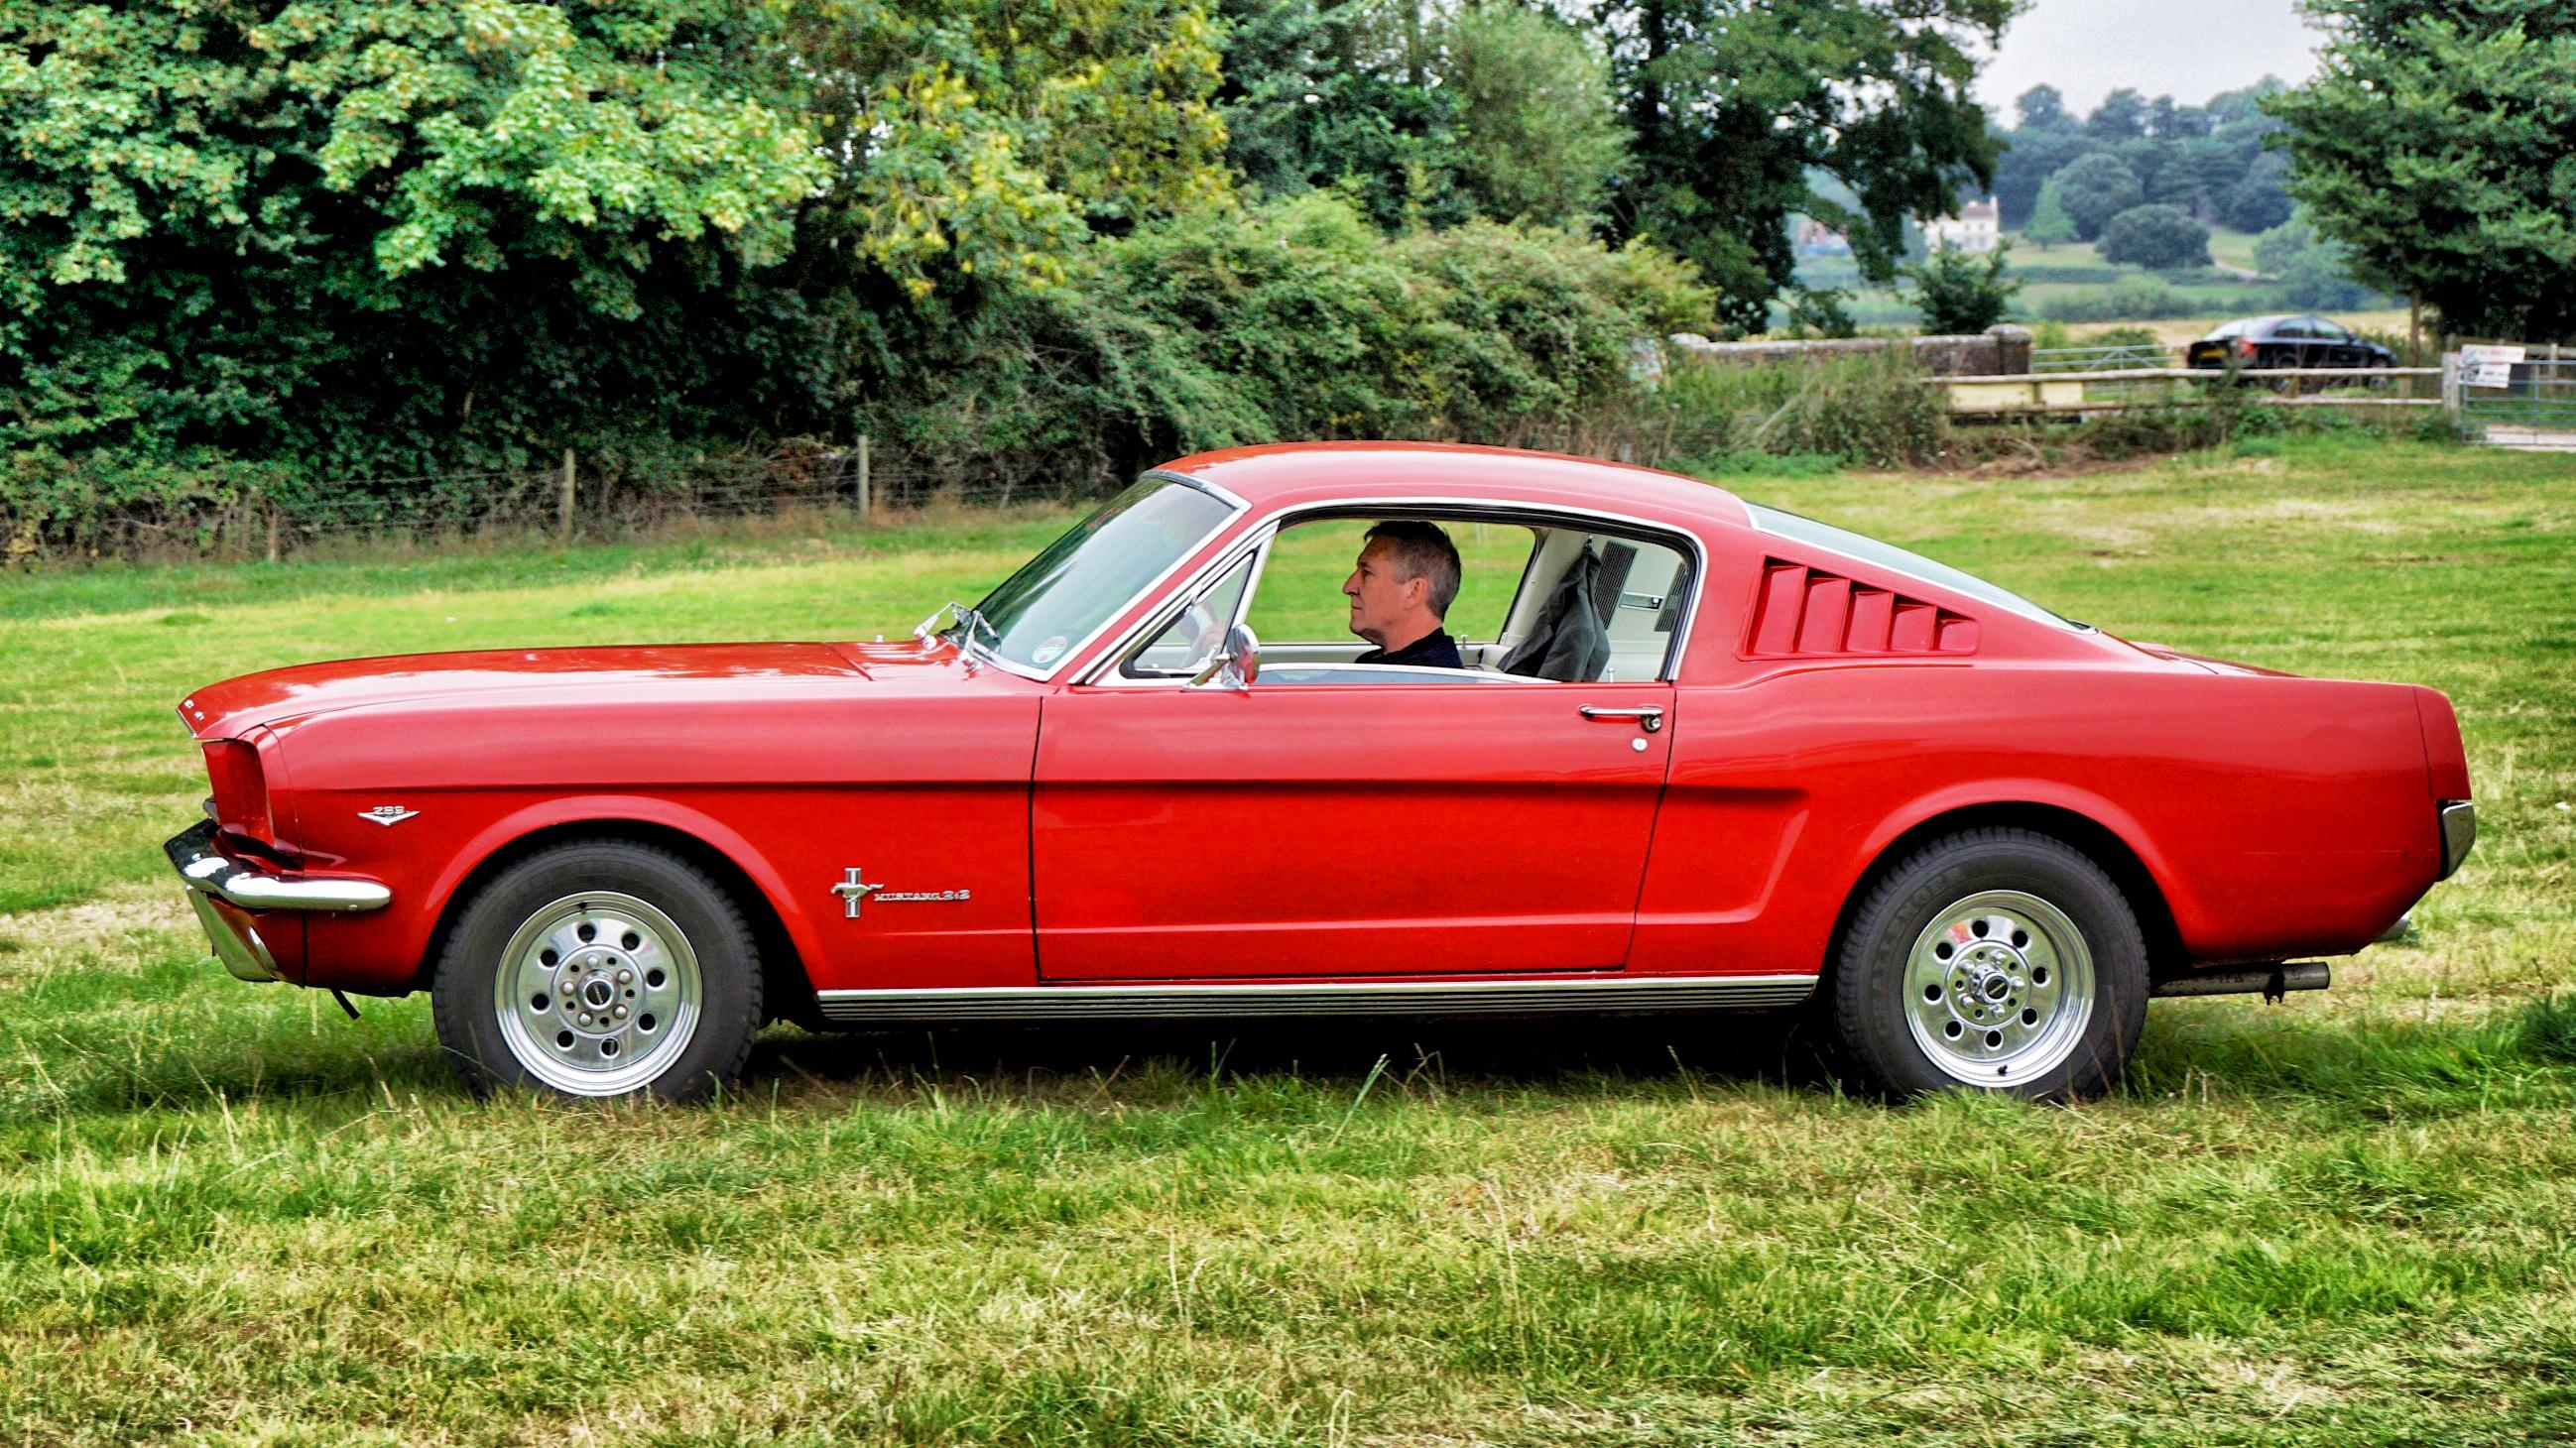 Mustang Mania Car Show